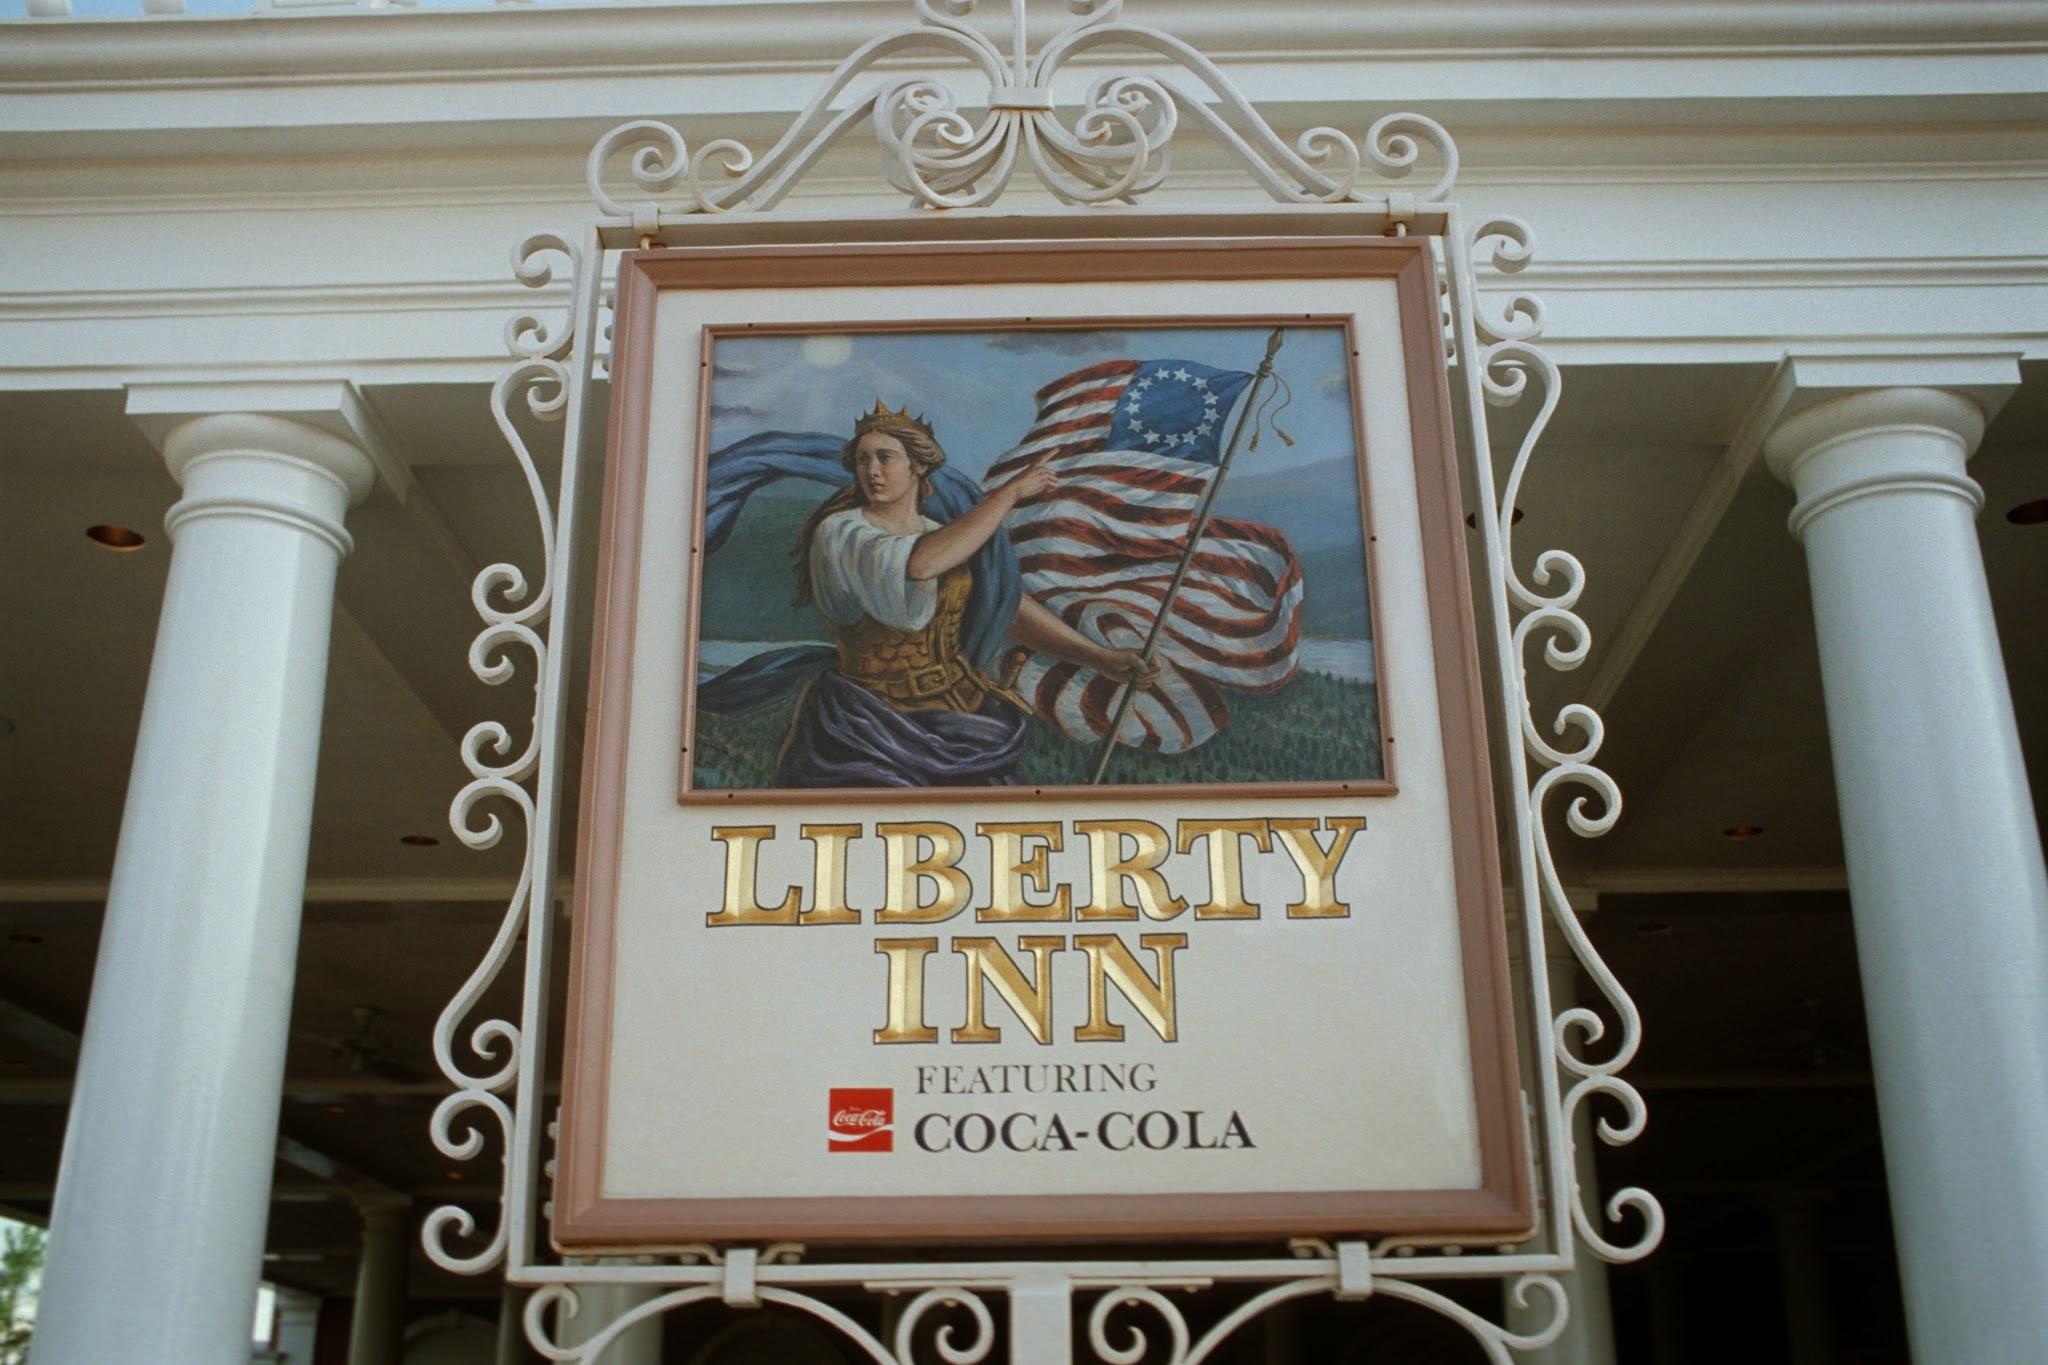 Liberty Inn image 1